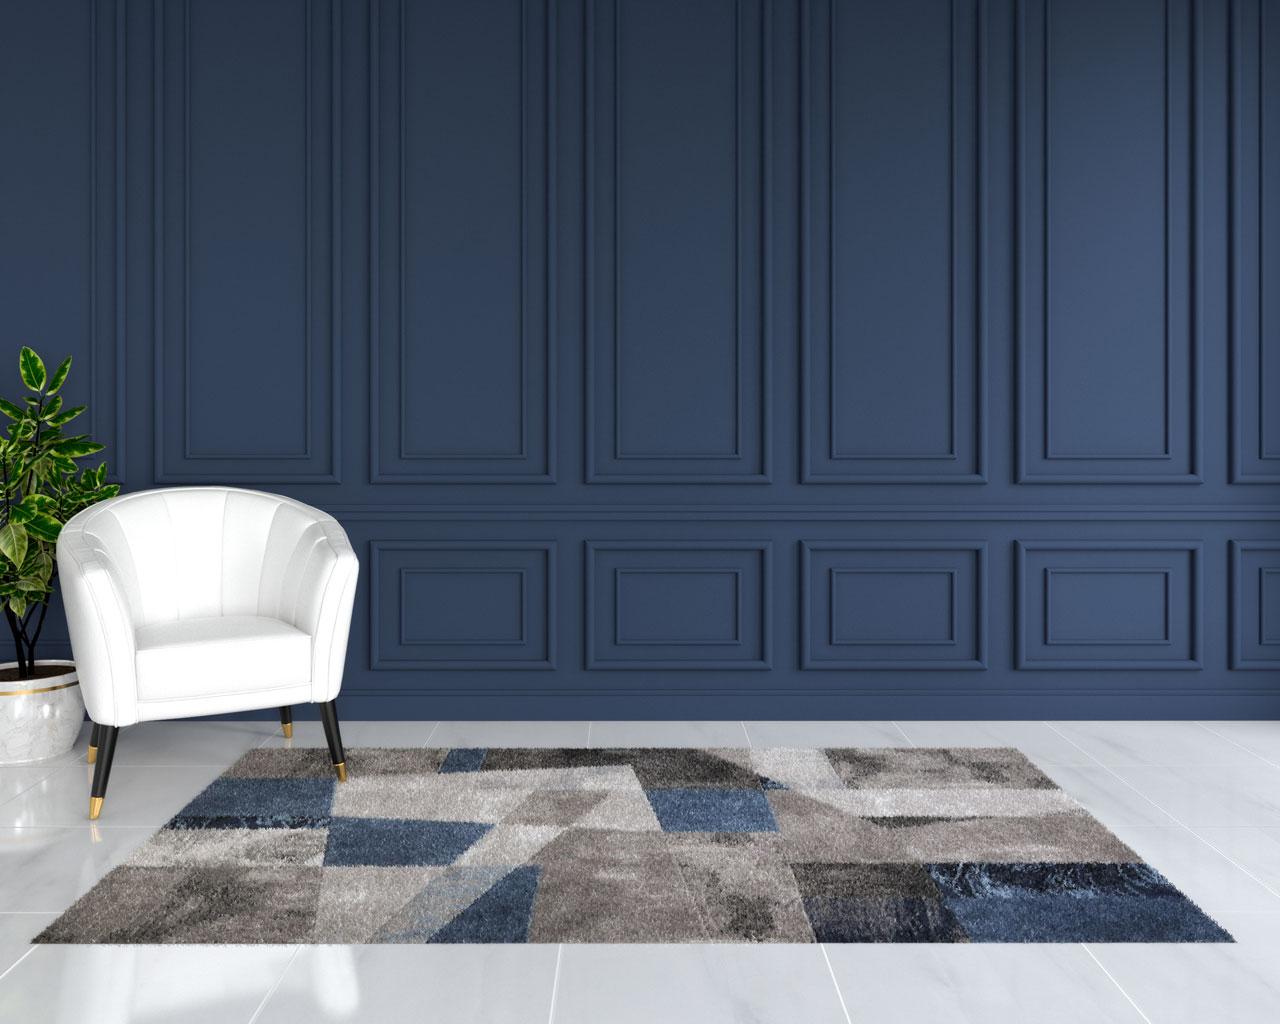 Modern geometric blue and gray rug